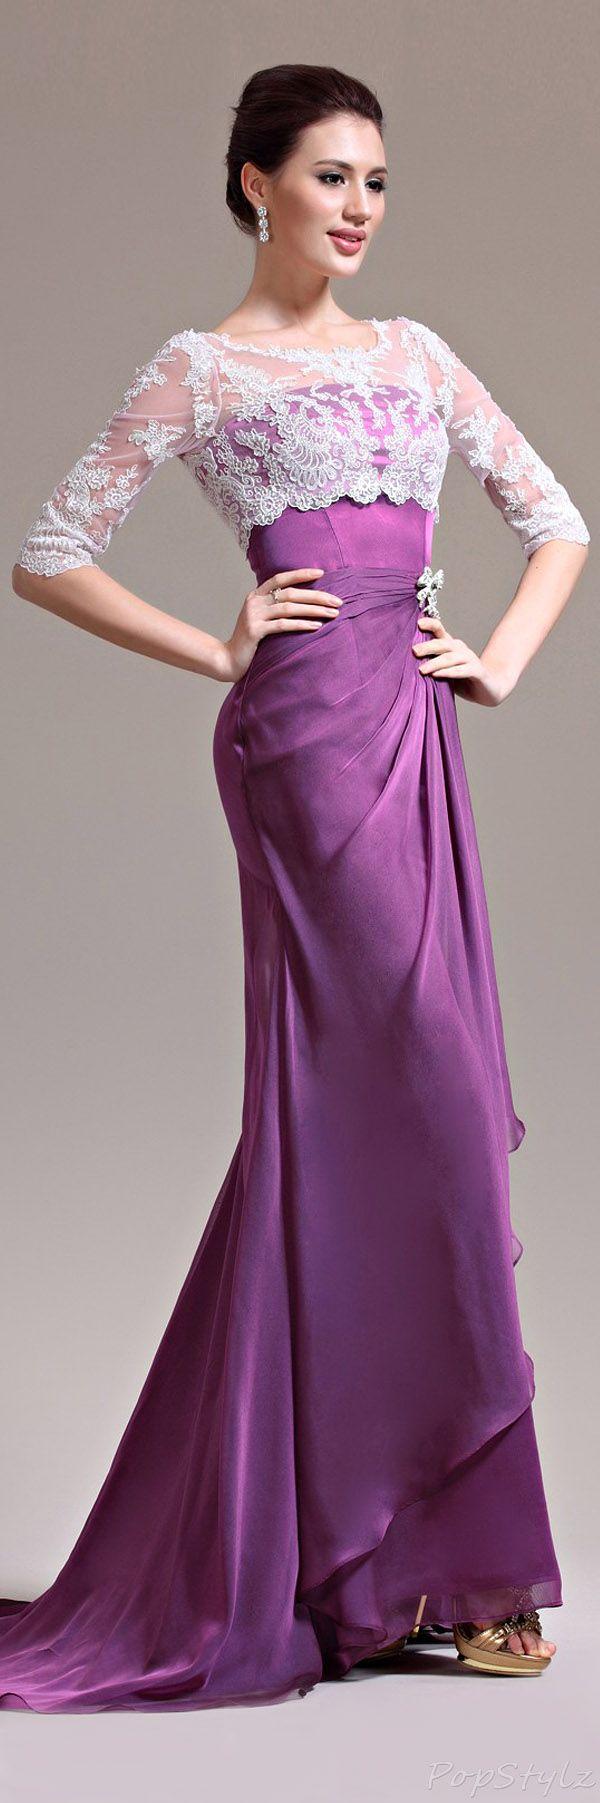 eDressit 26134512 Evening Gown | ropa | Pinterest | Vestiditos ...